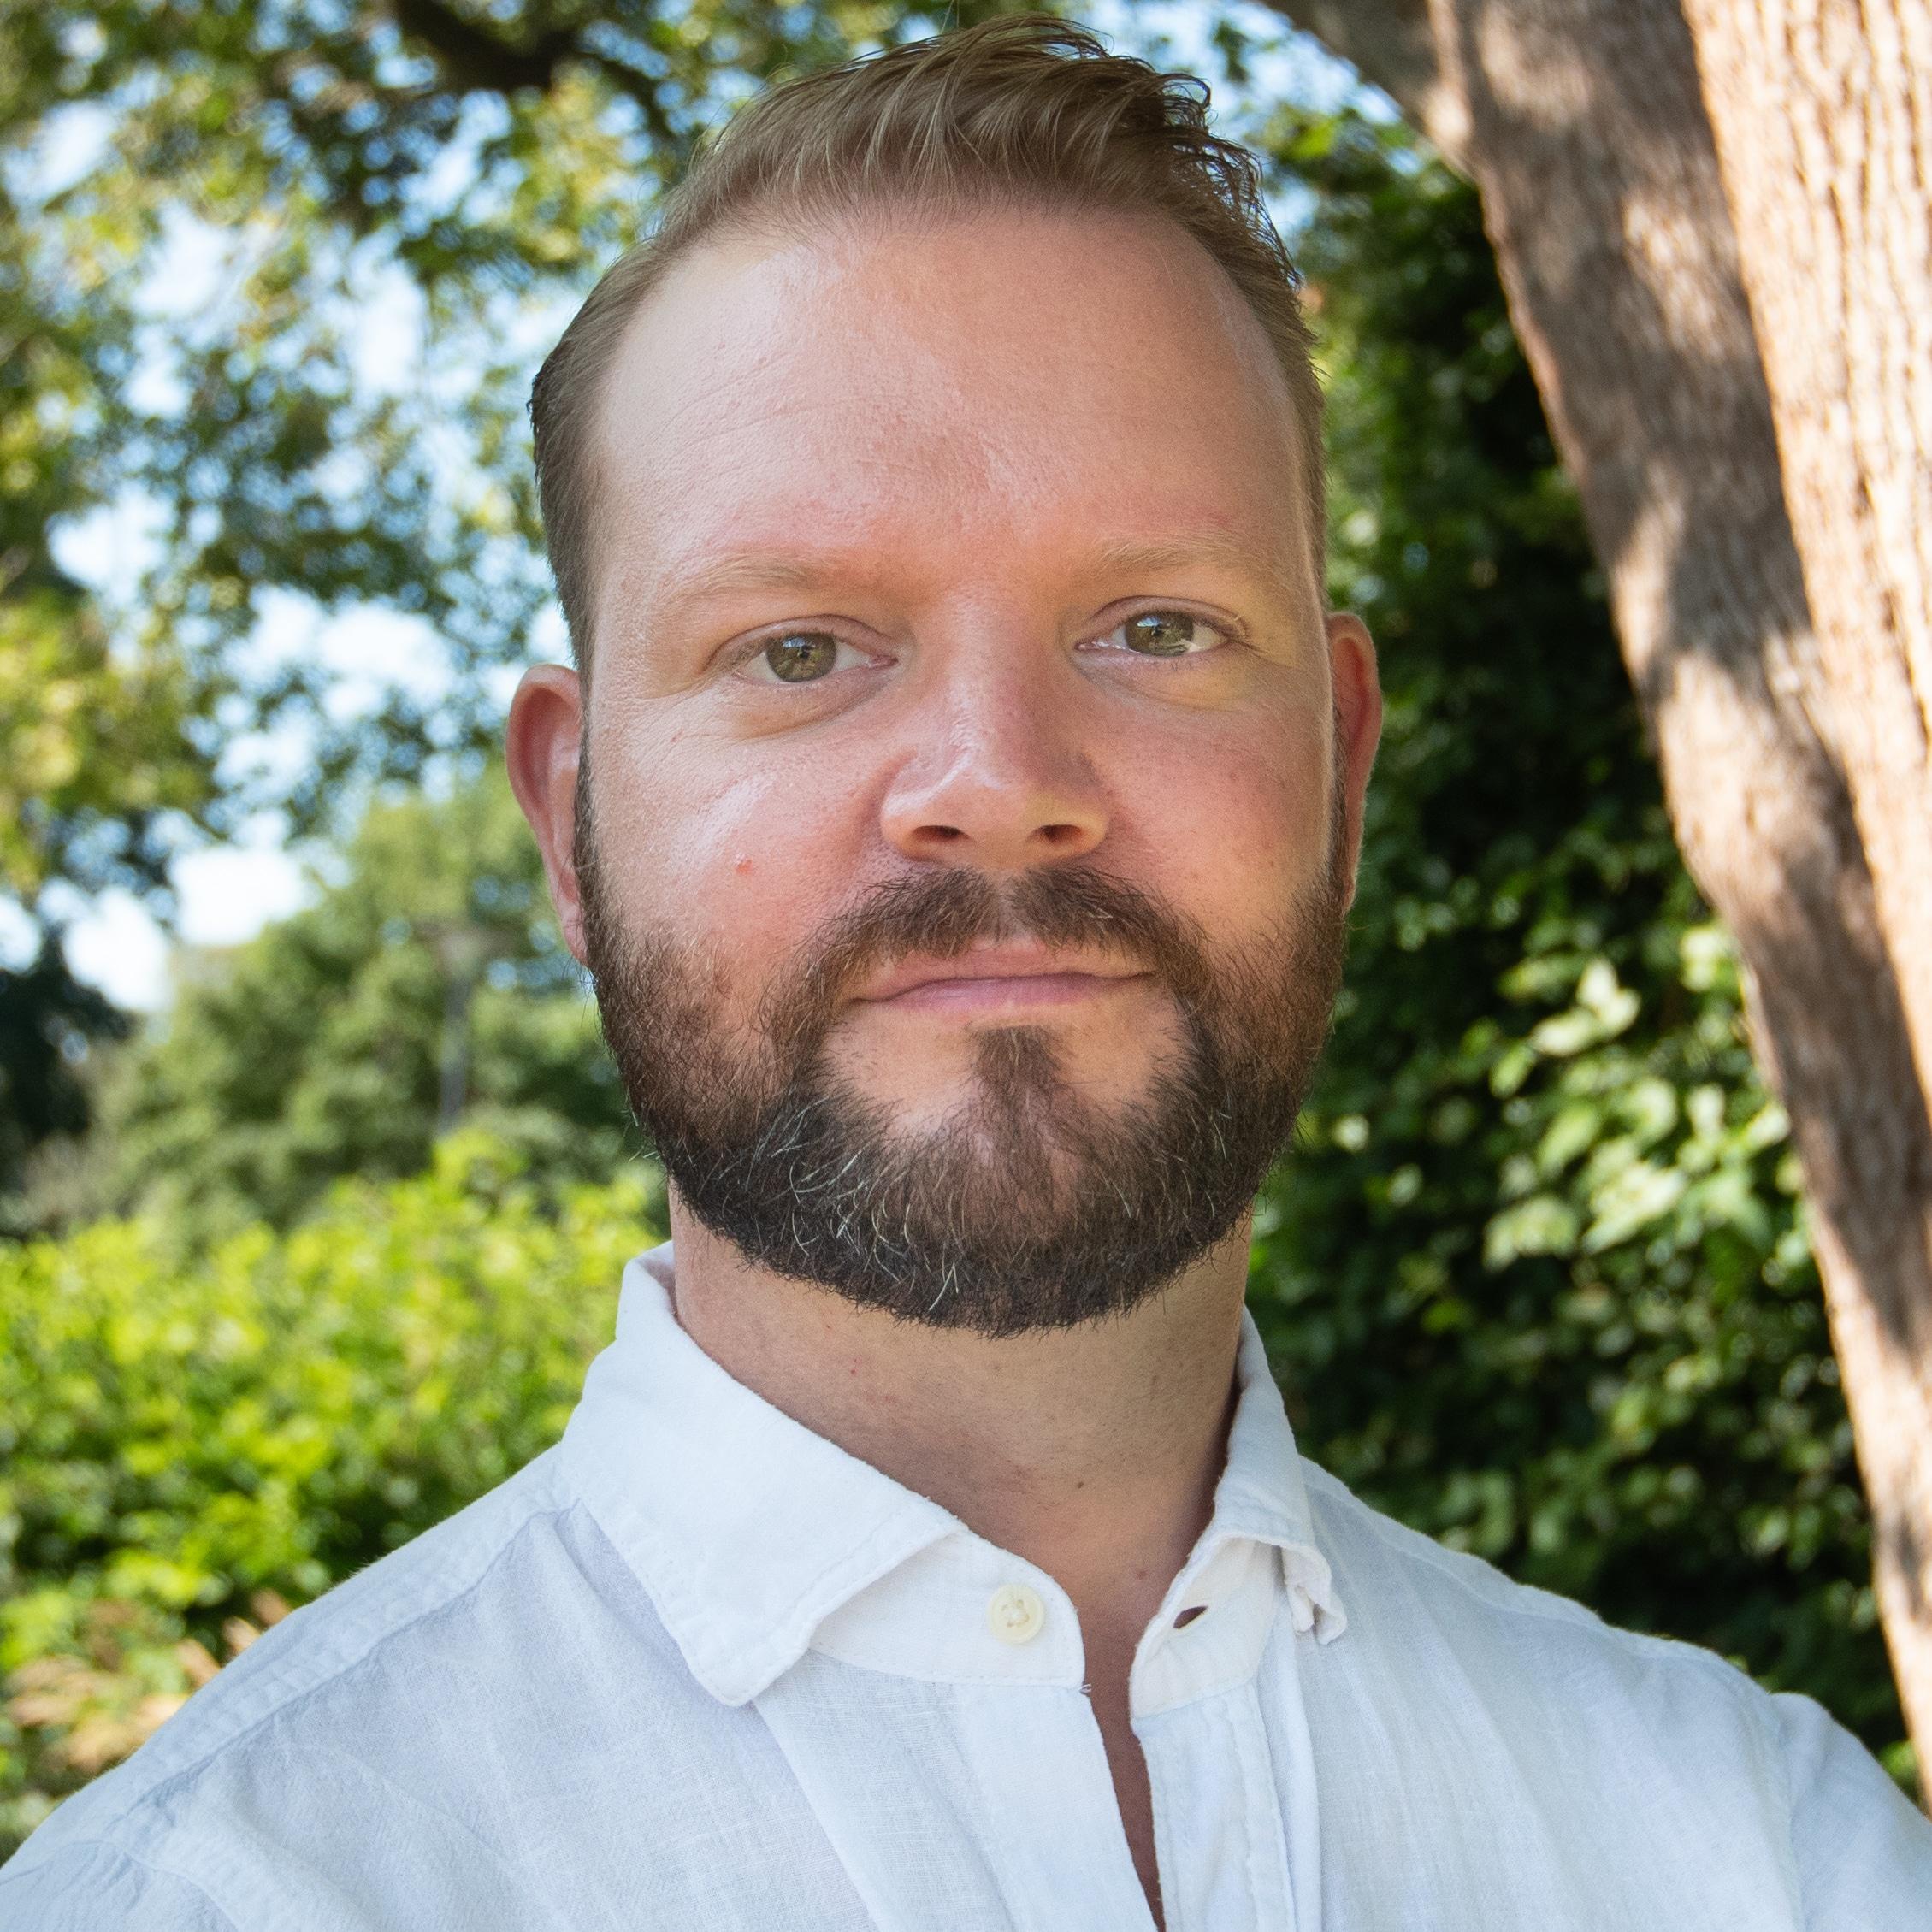 Tobias Svensson (1 av 3)